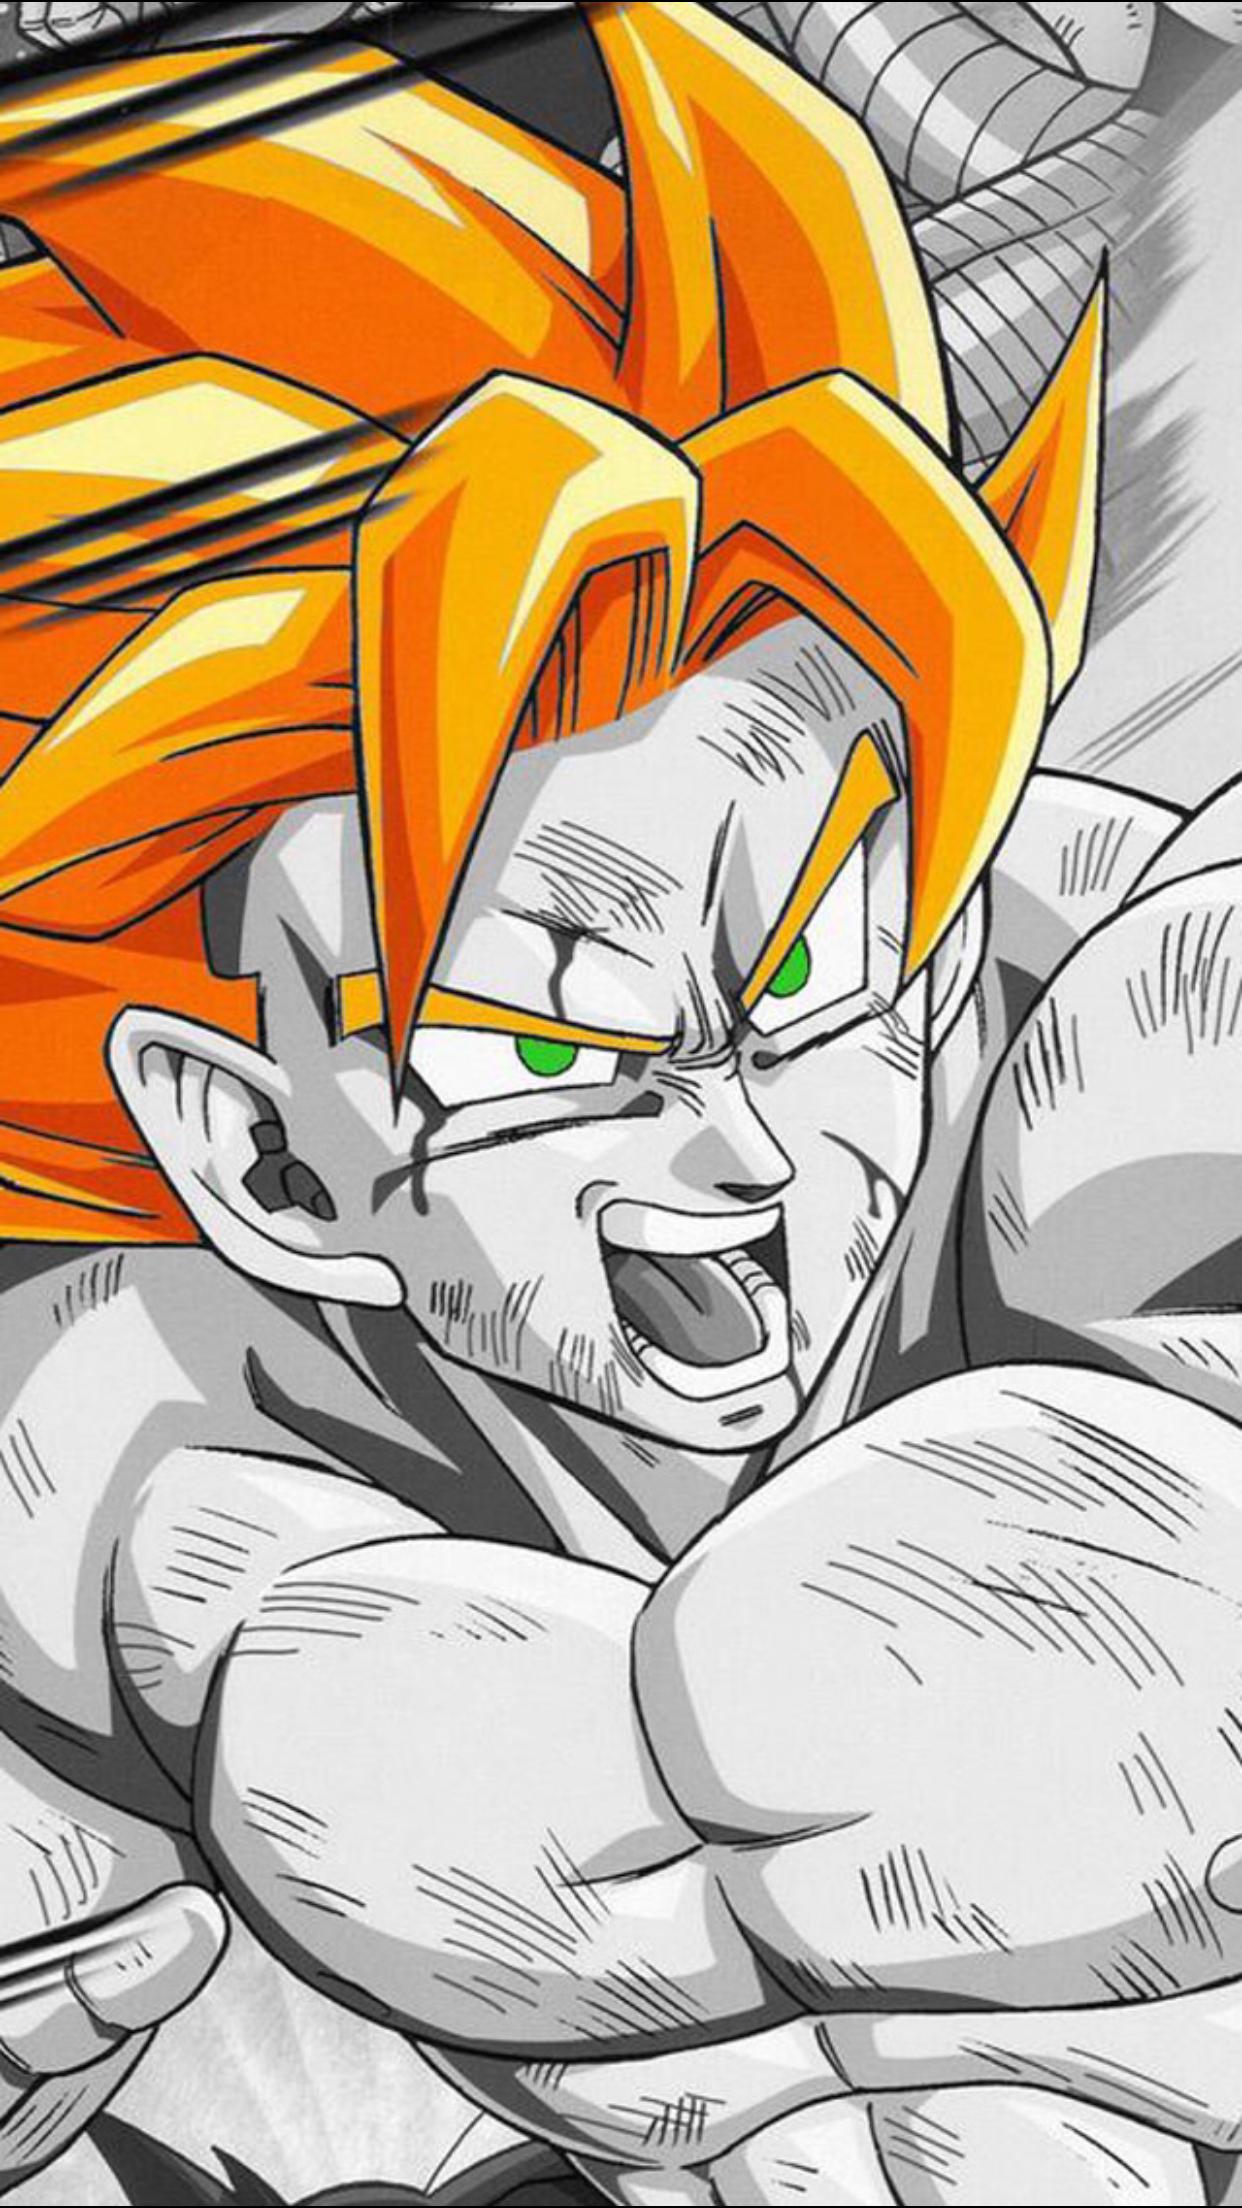 Goku Ssj Visit Now For 3d Dragon Ball Z Compression Shirts Now On Sale Dragonball Dbz Dragonballsuper Dragones Goku Personajes De Dragon Ball